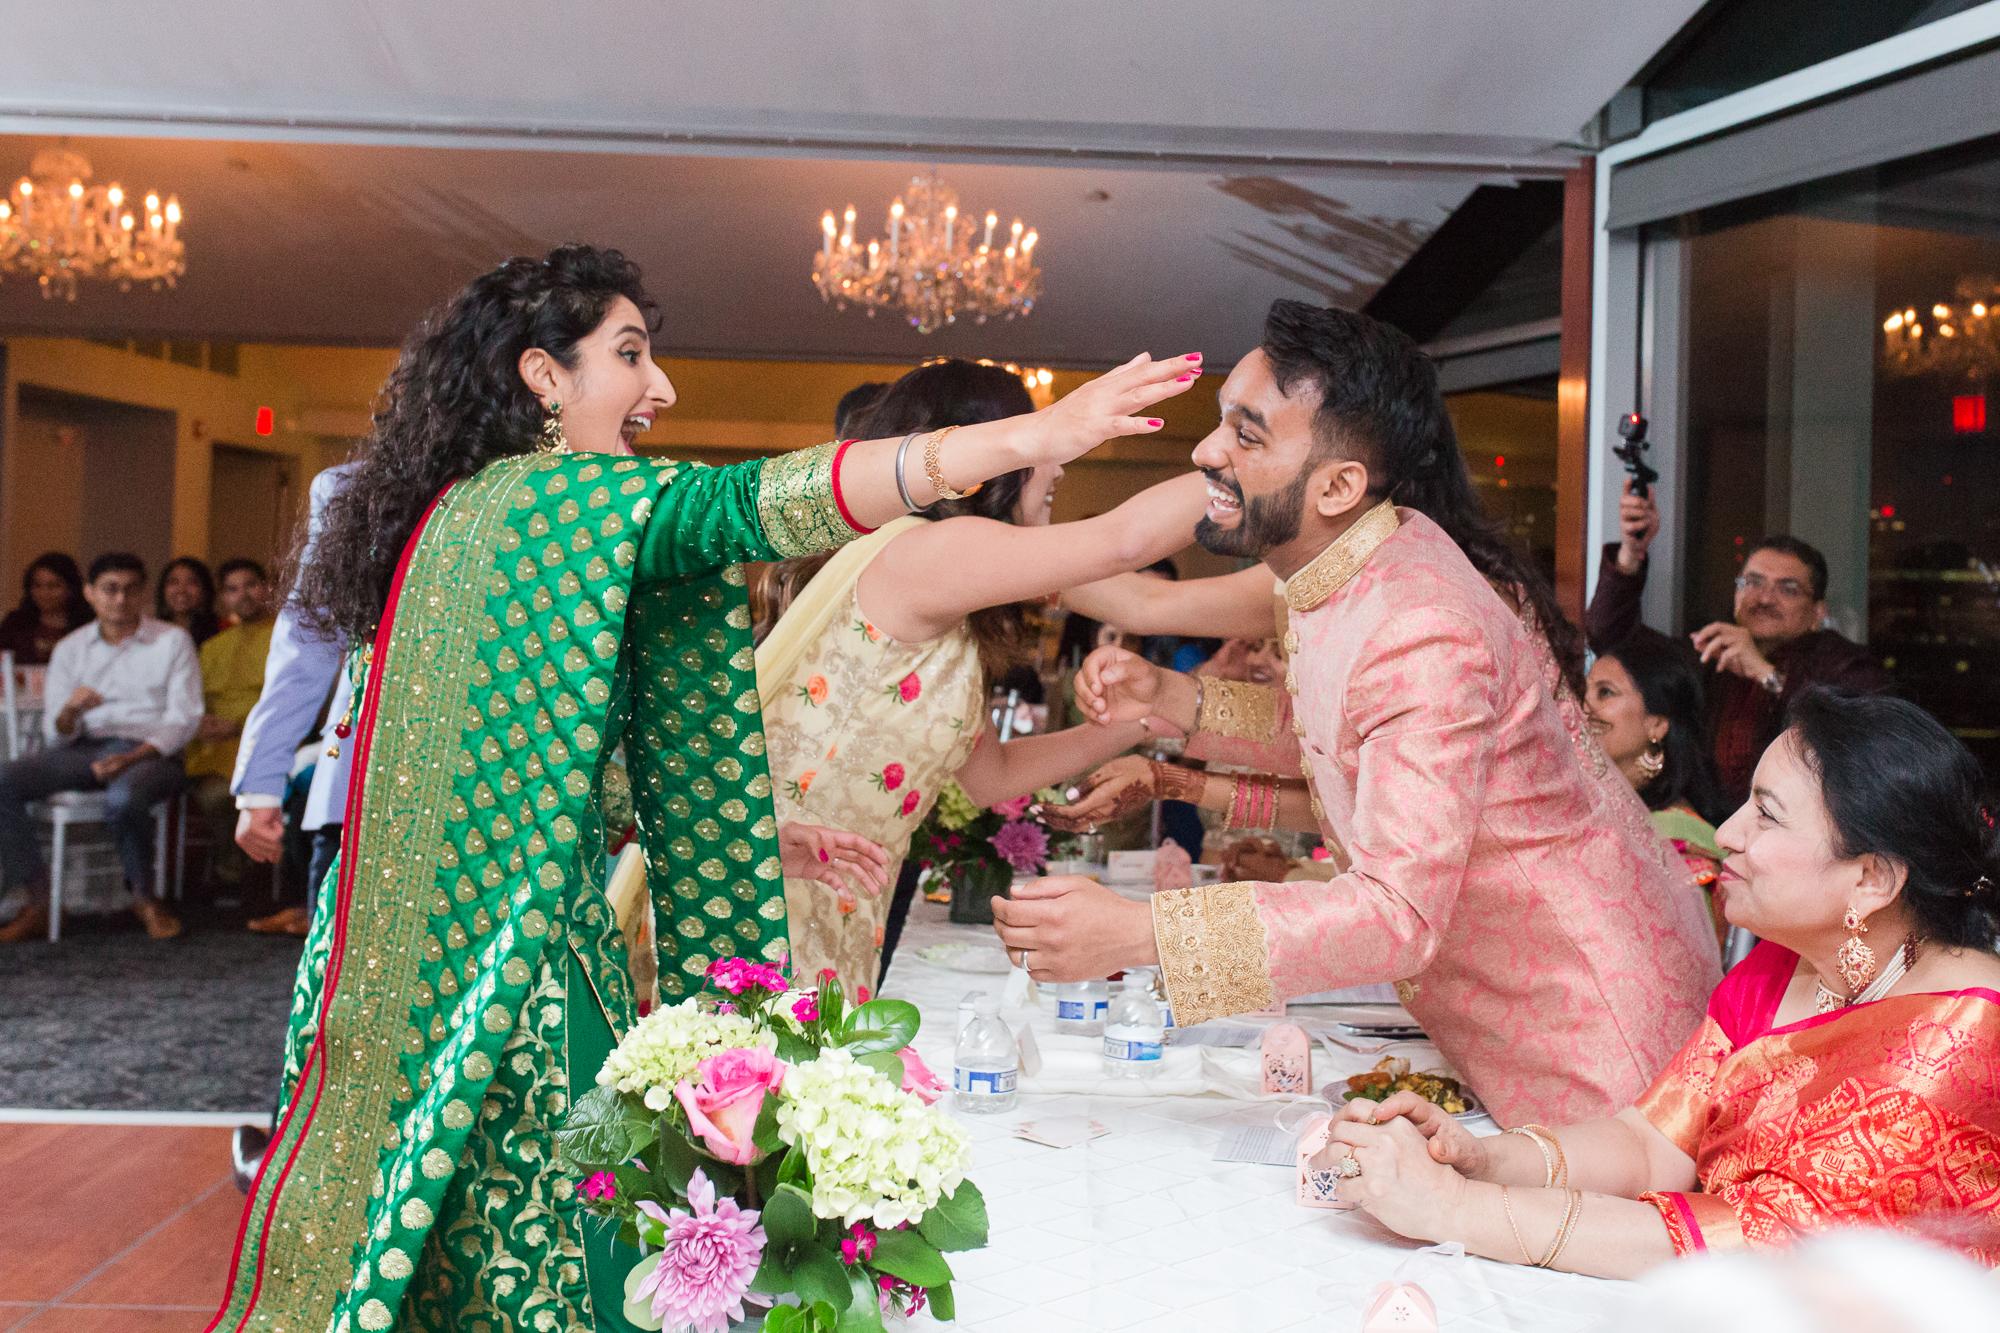 anumeet and gopika, indian engagement ring ceremony, top of the town, alexandria, northern virginia, nova weddings-94.jpg